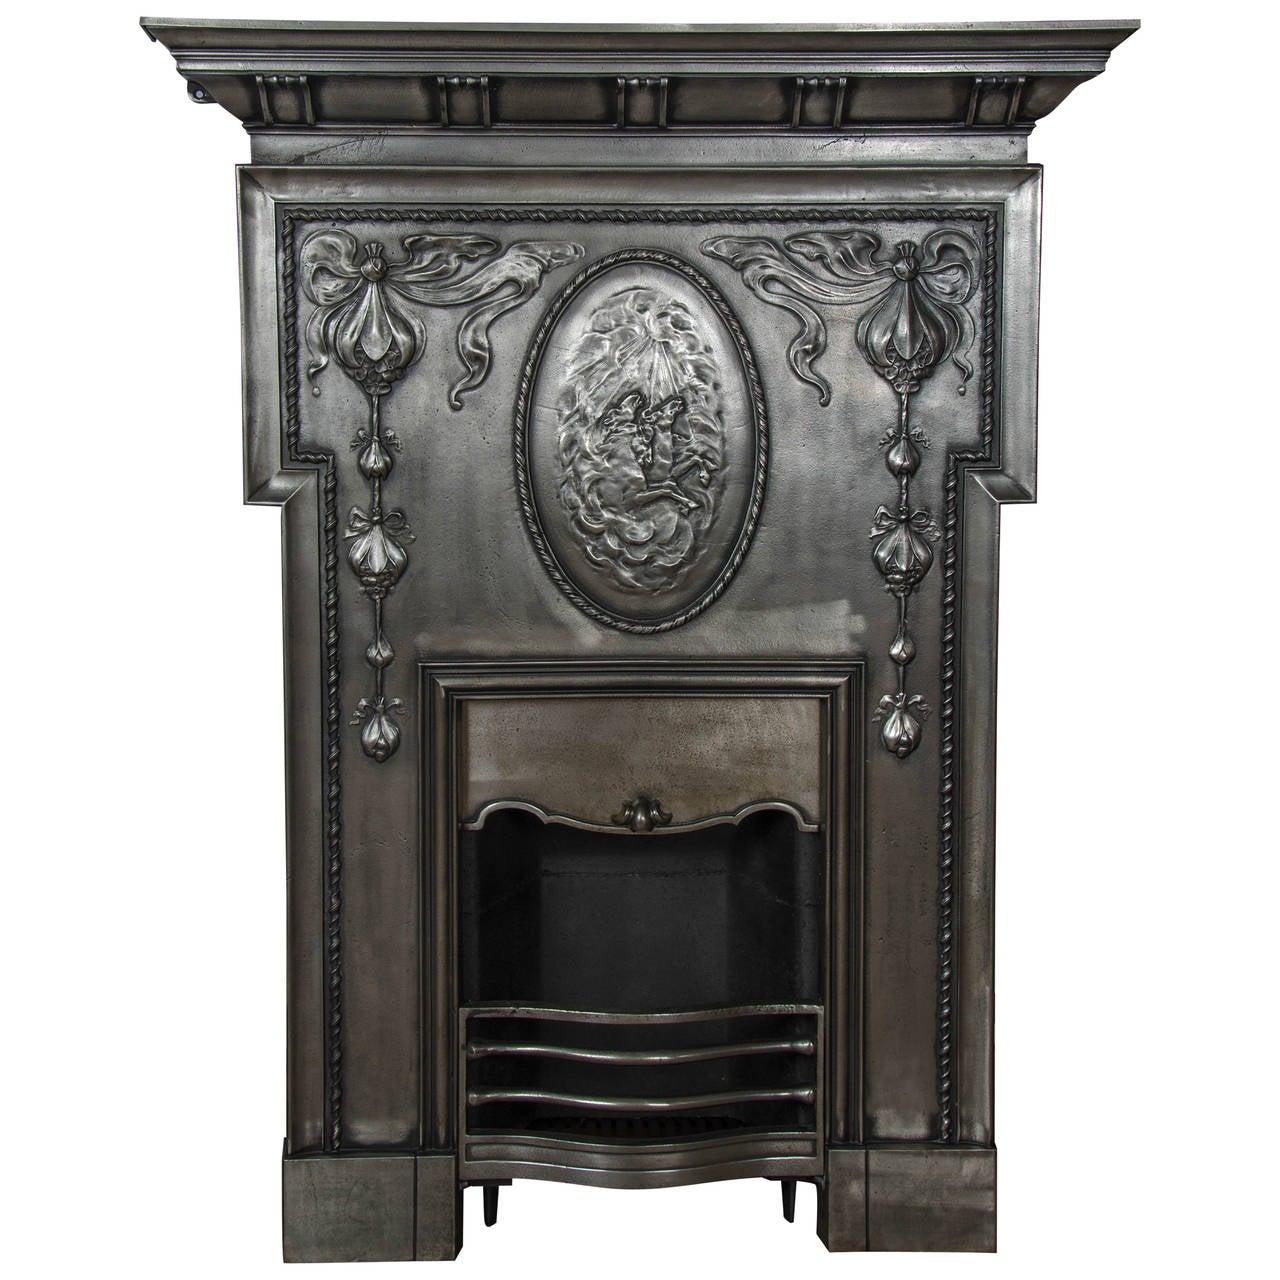 Antique Edwardian Polished Cast Iron Fireplace At 1stdibs